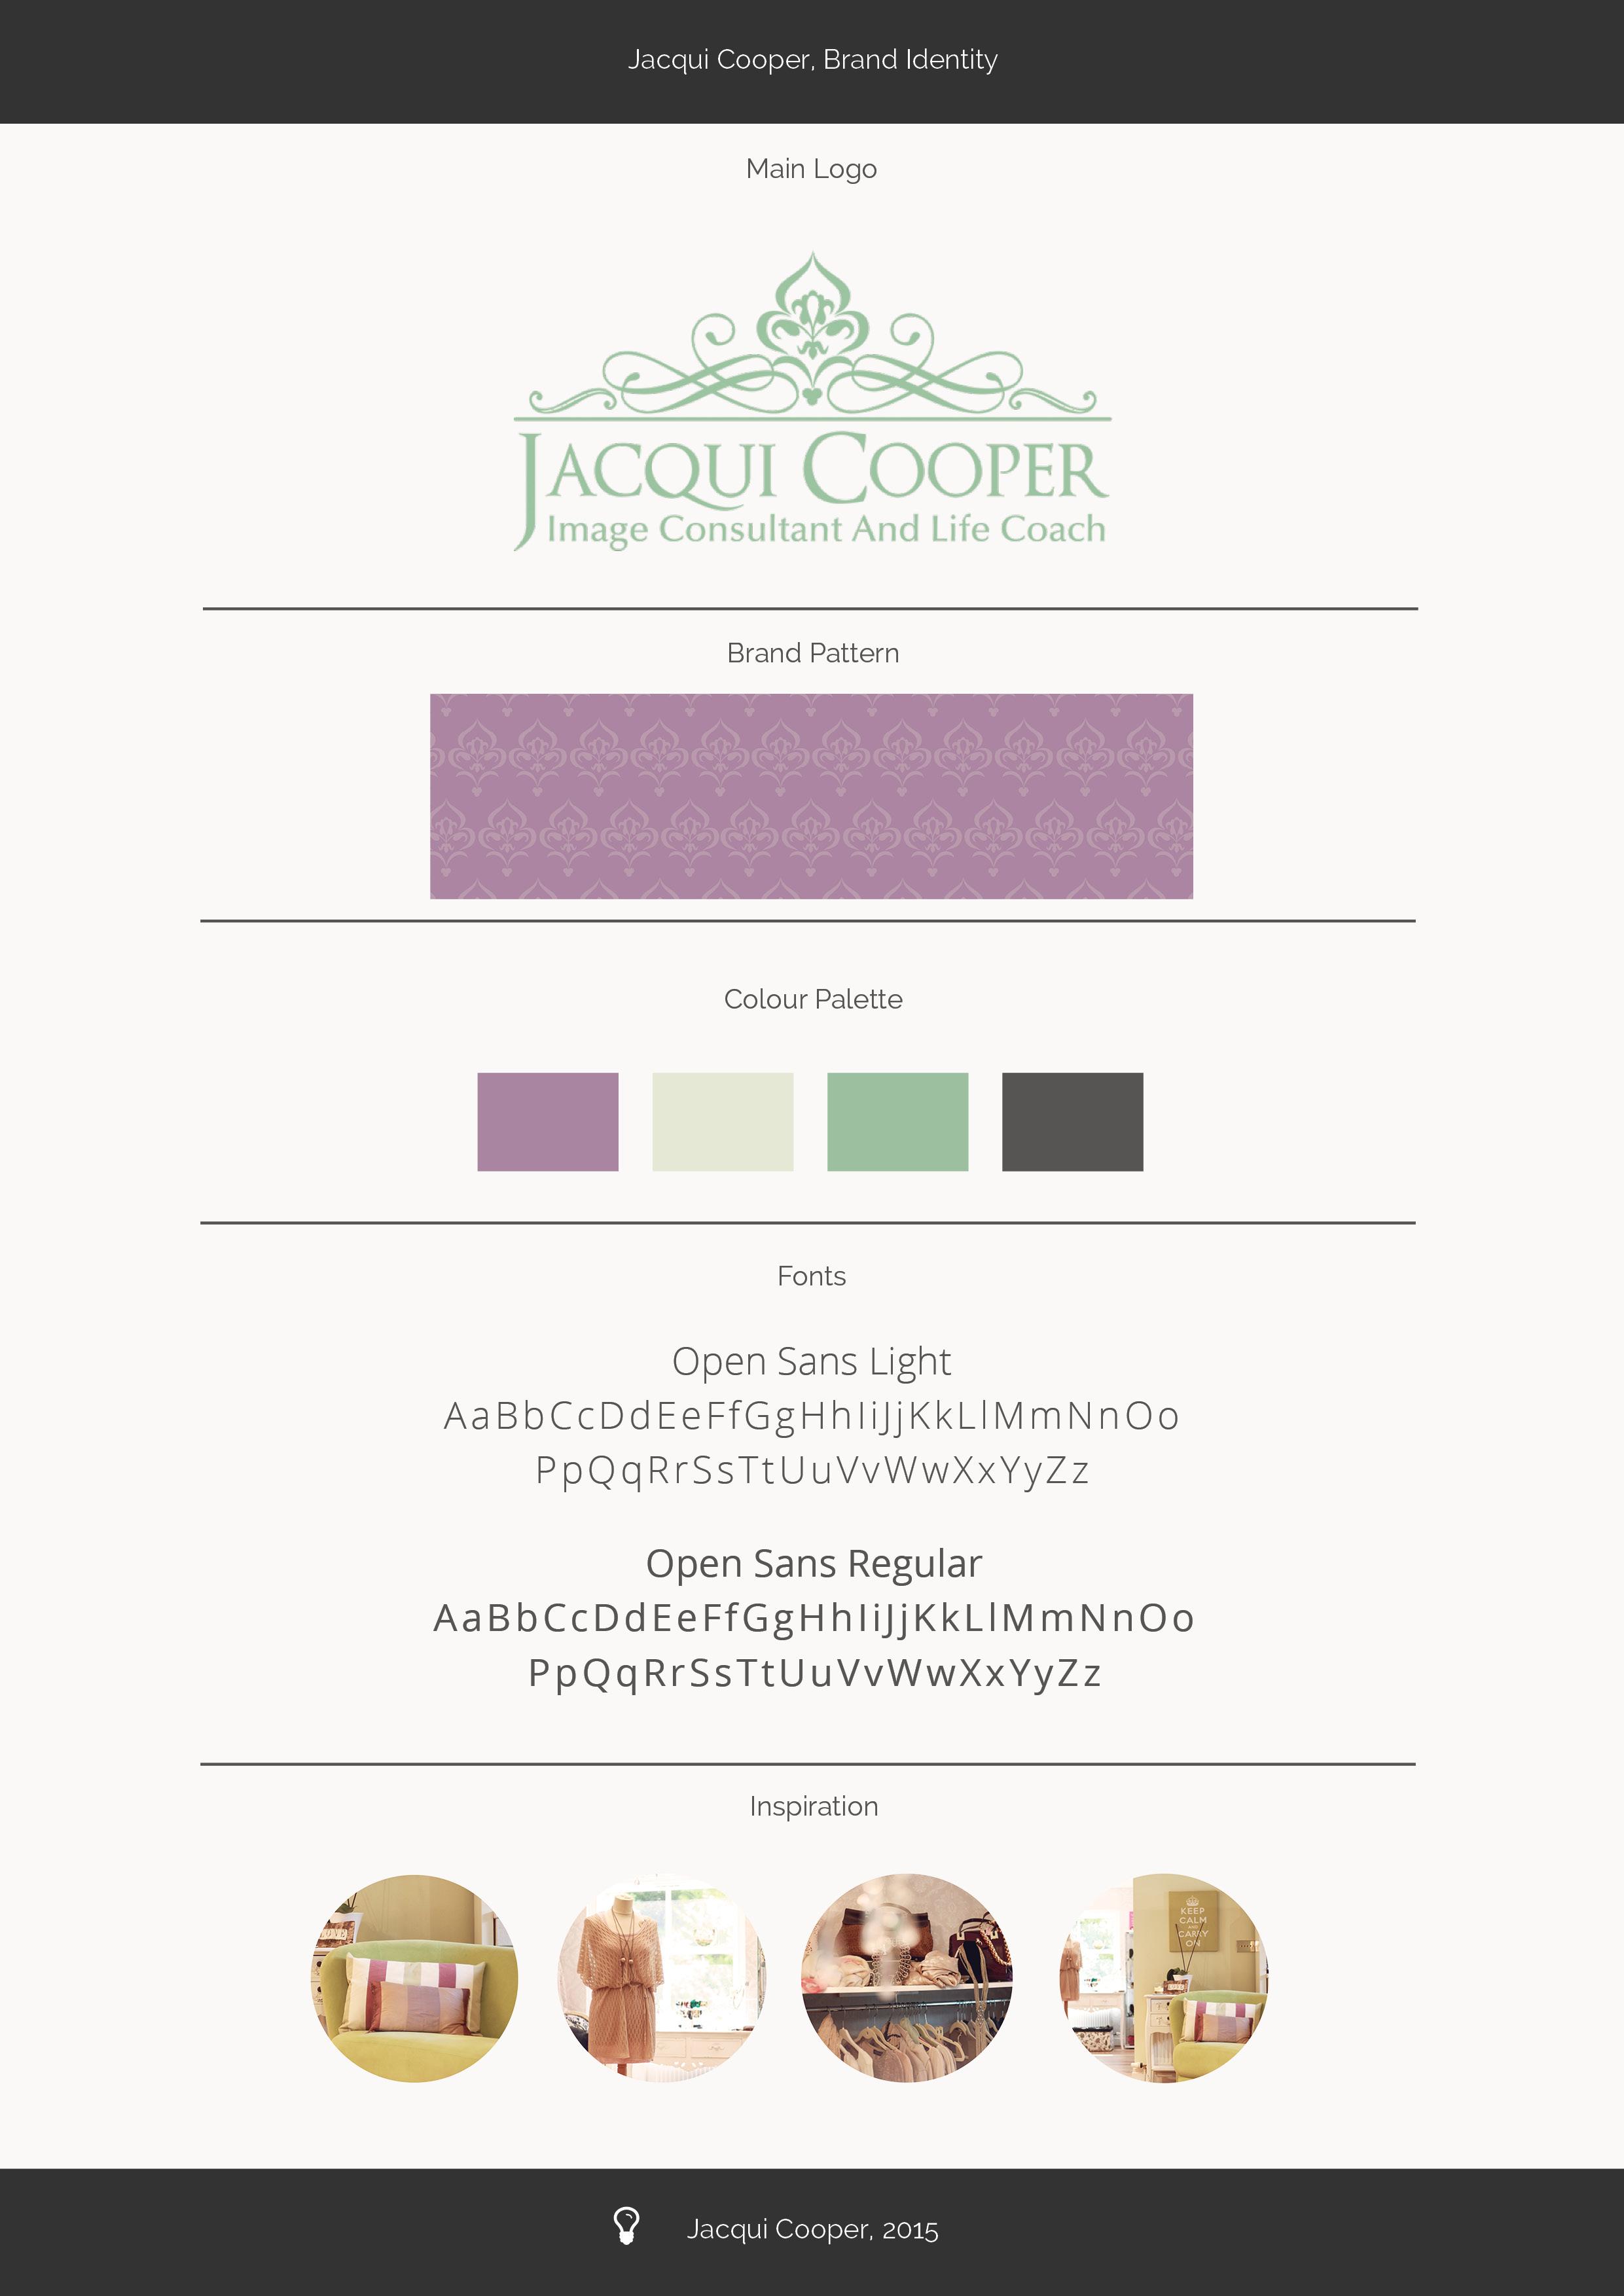 Jacqui Cooper Brand Identity